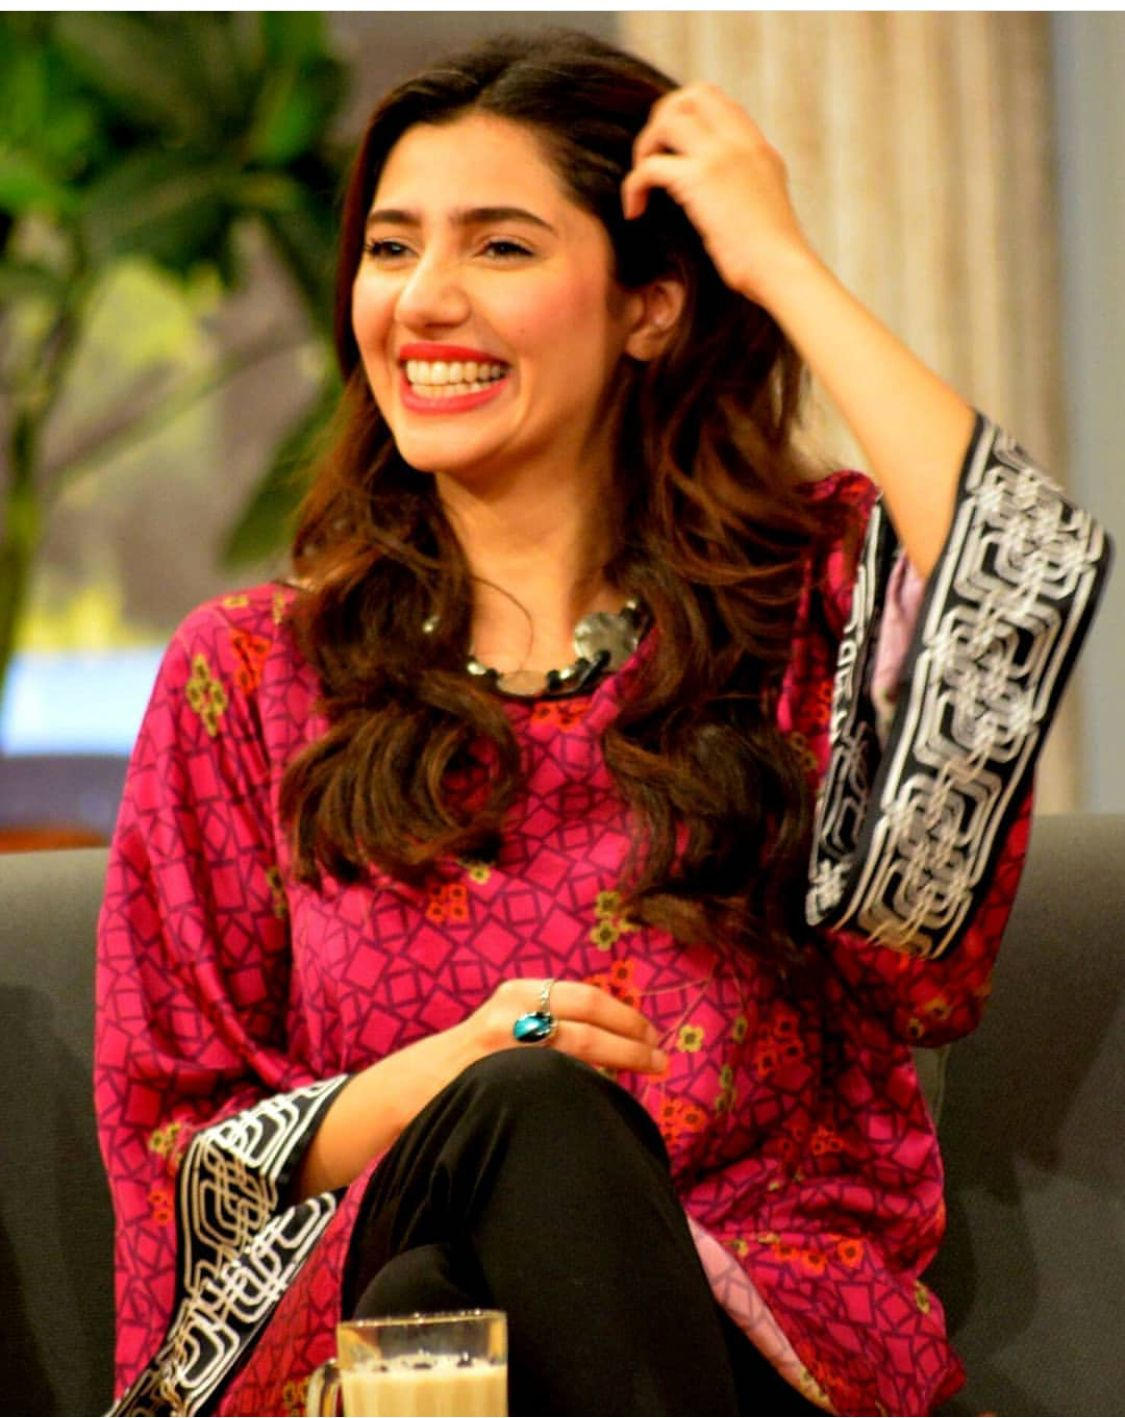 Pin by hnoor2 on mahira khan | Mahira khan, Pakistani actress, Fashion